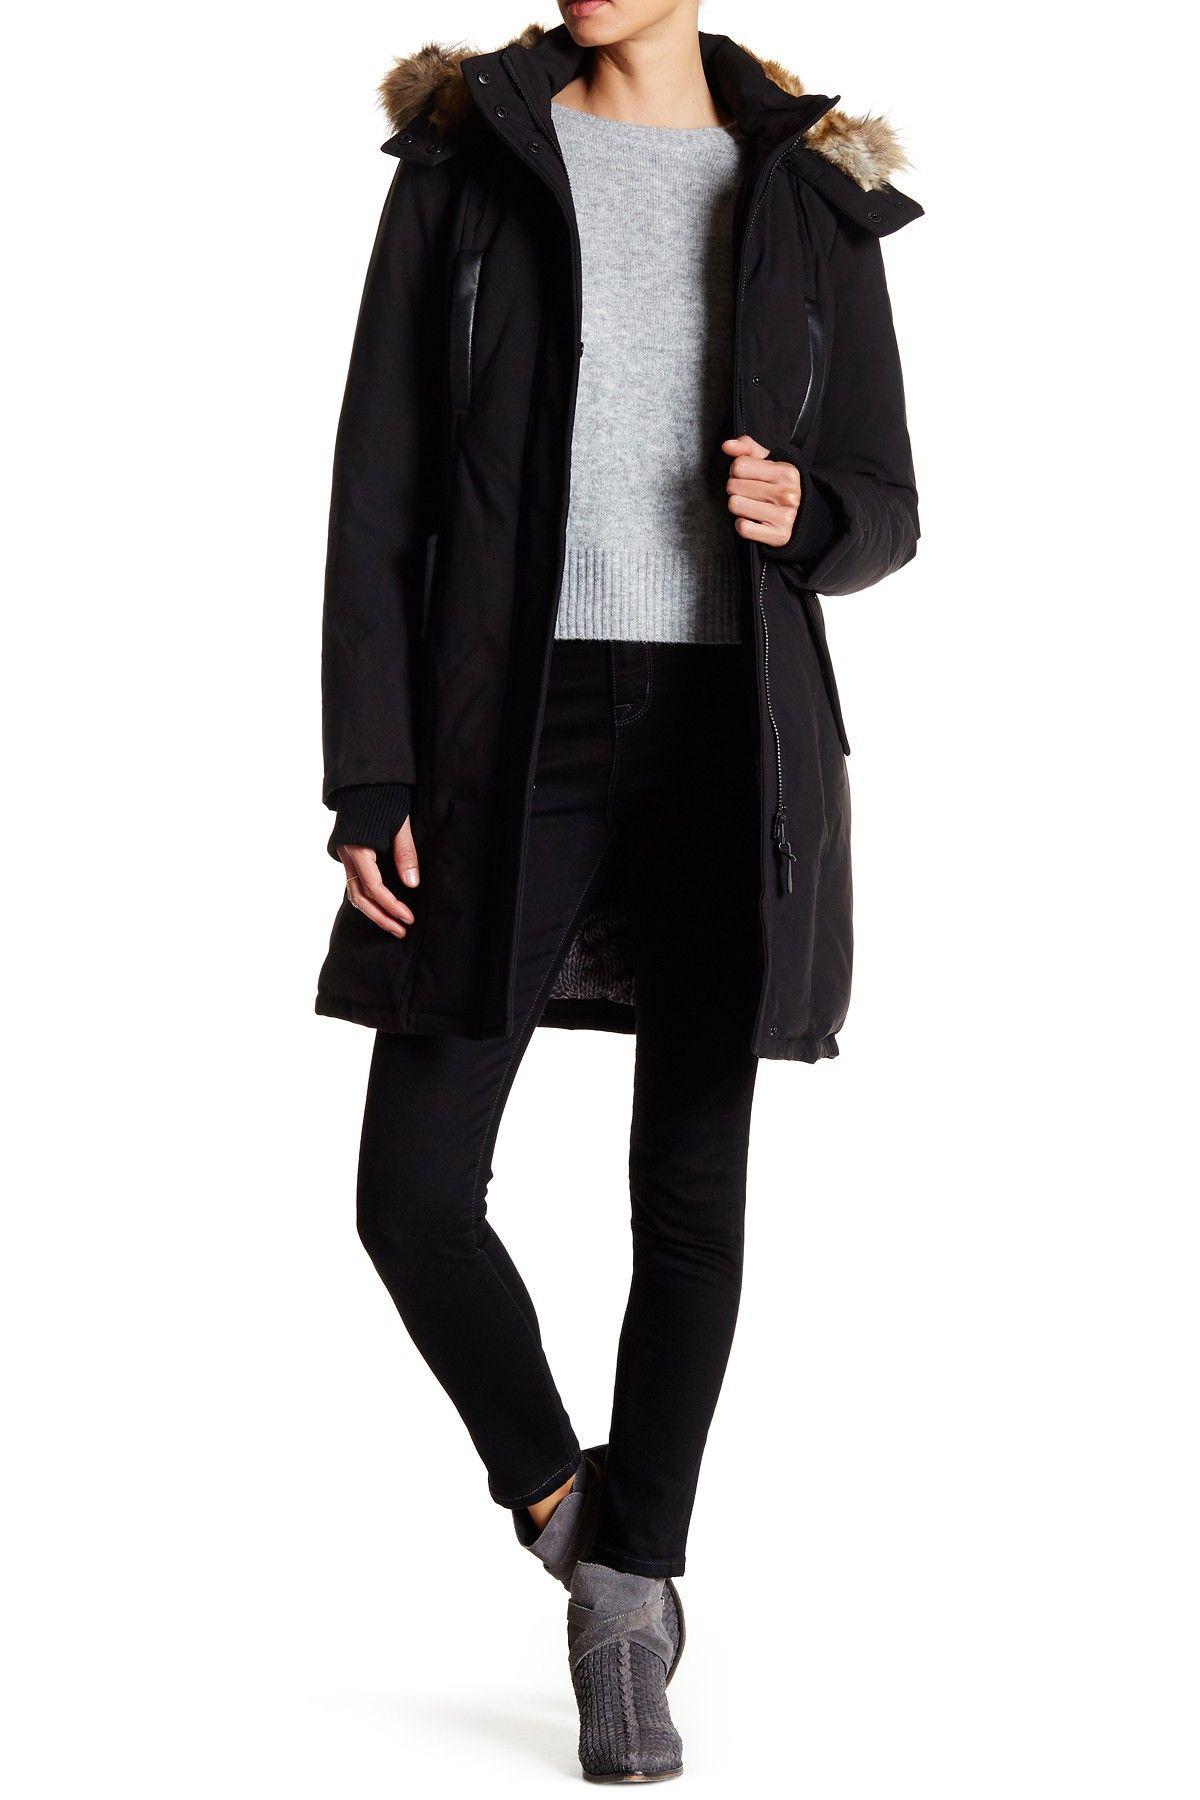 Faux Fur Coats Nordstrom Tradingbasis